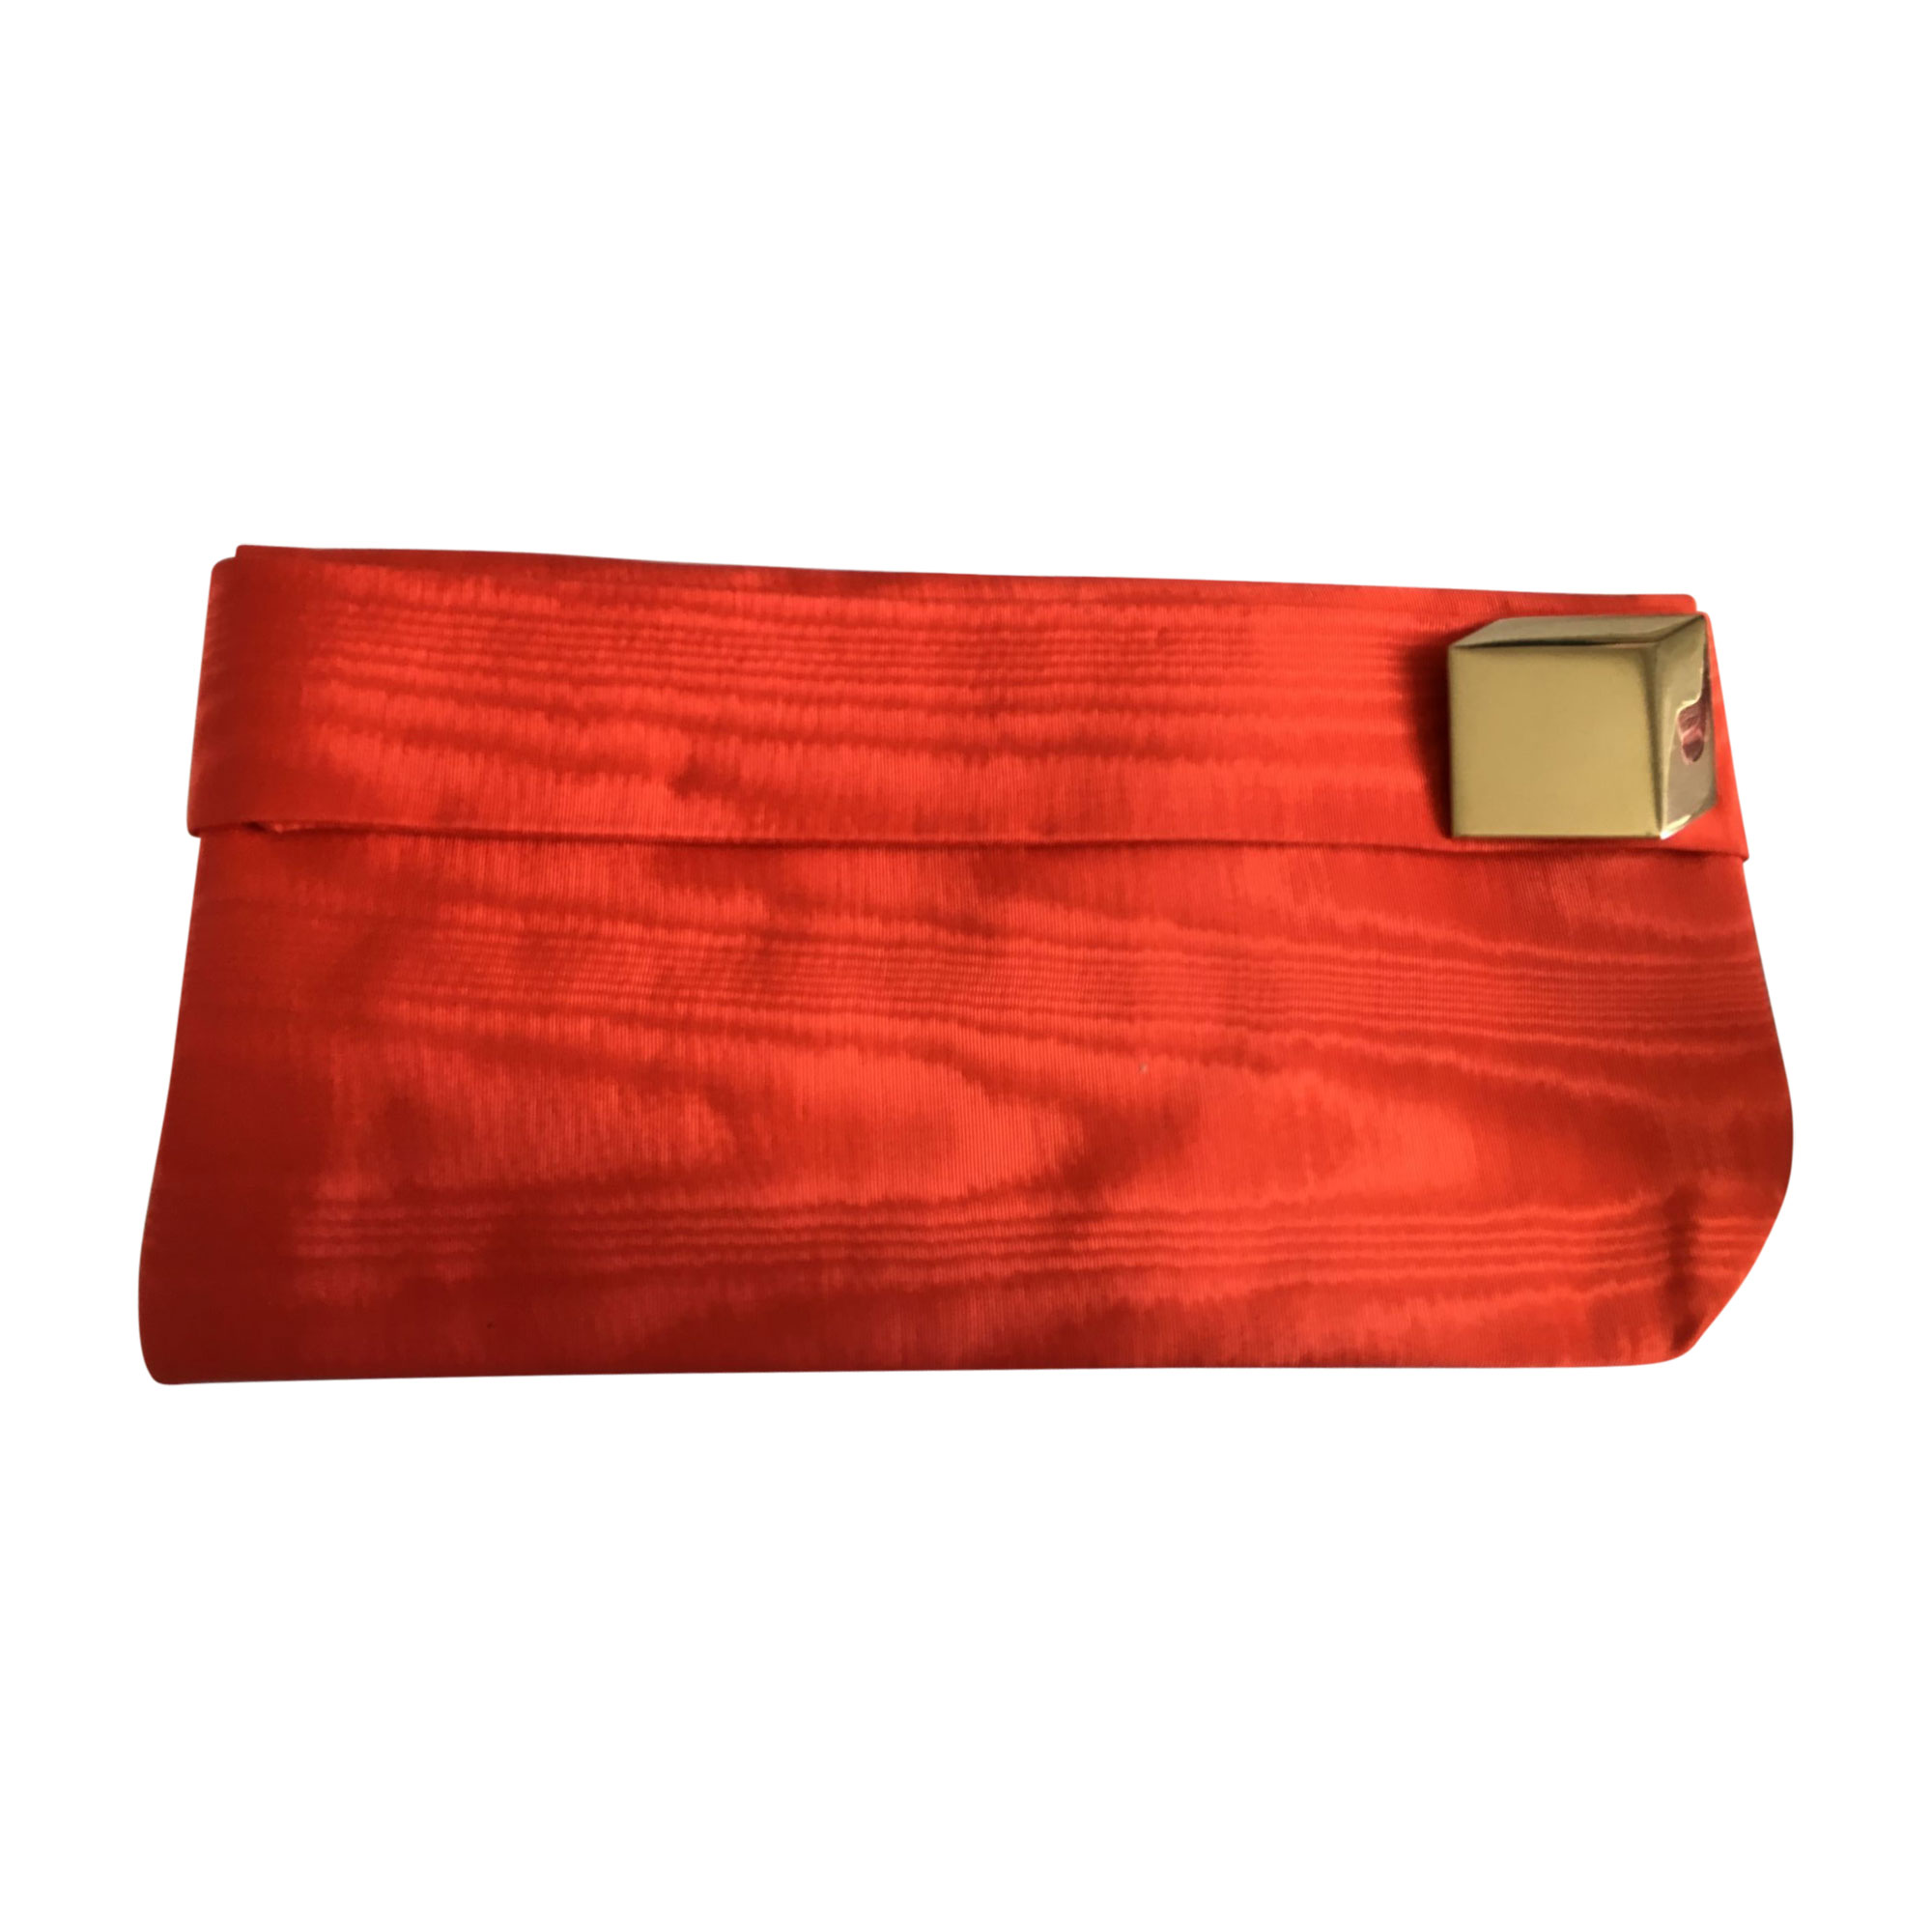 Sac pochette en tissu PIERRE HARDY Orange